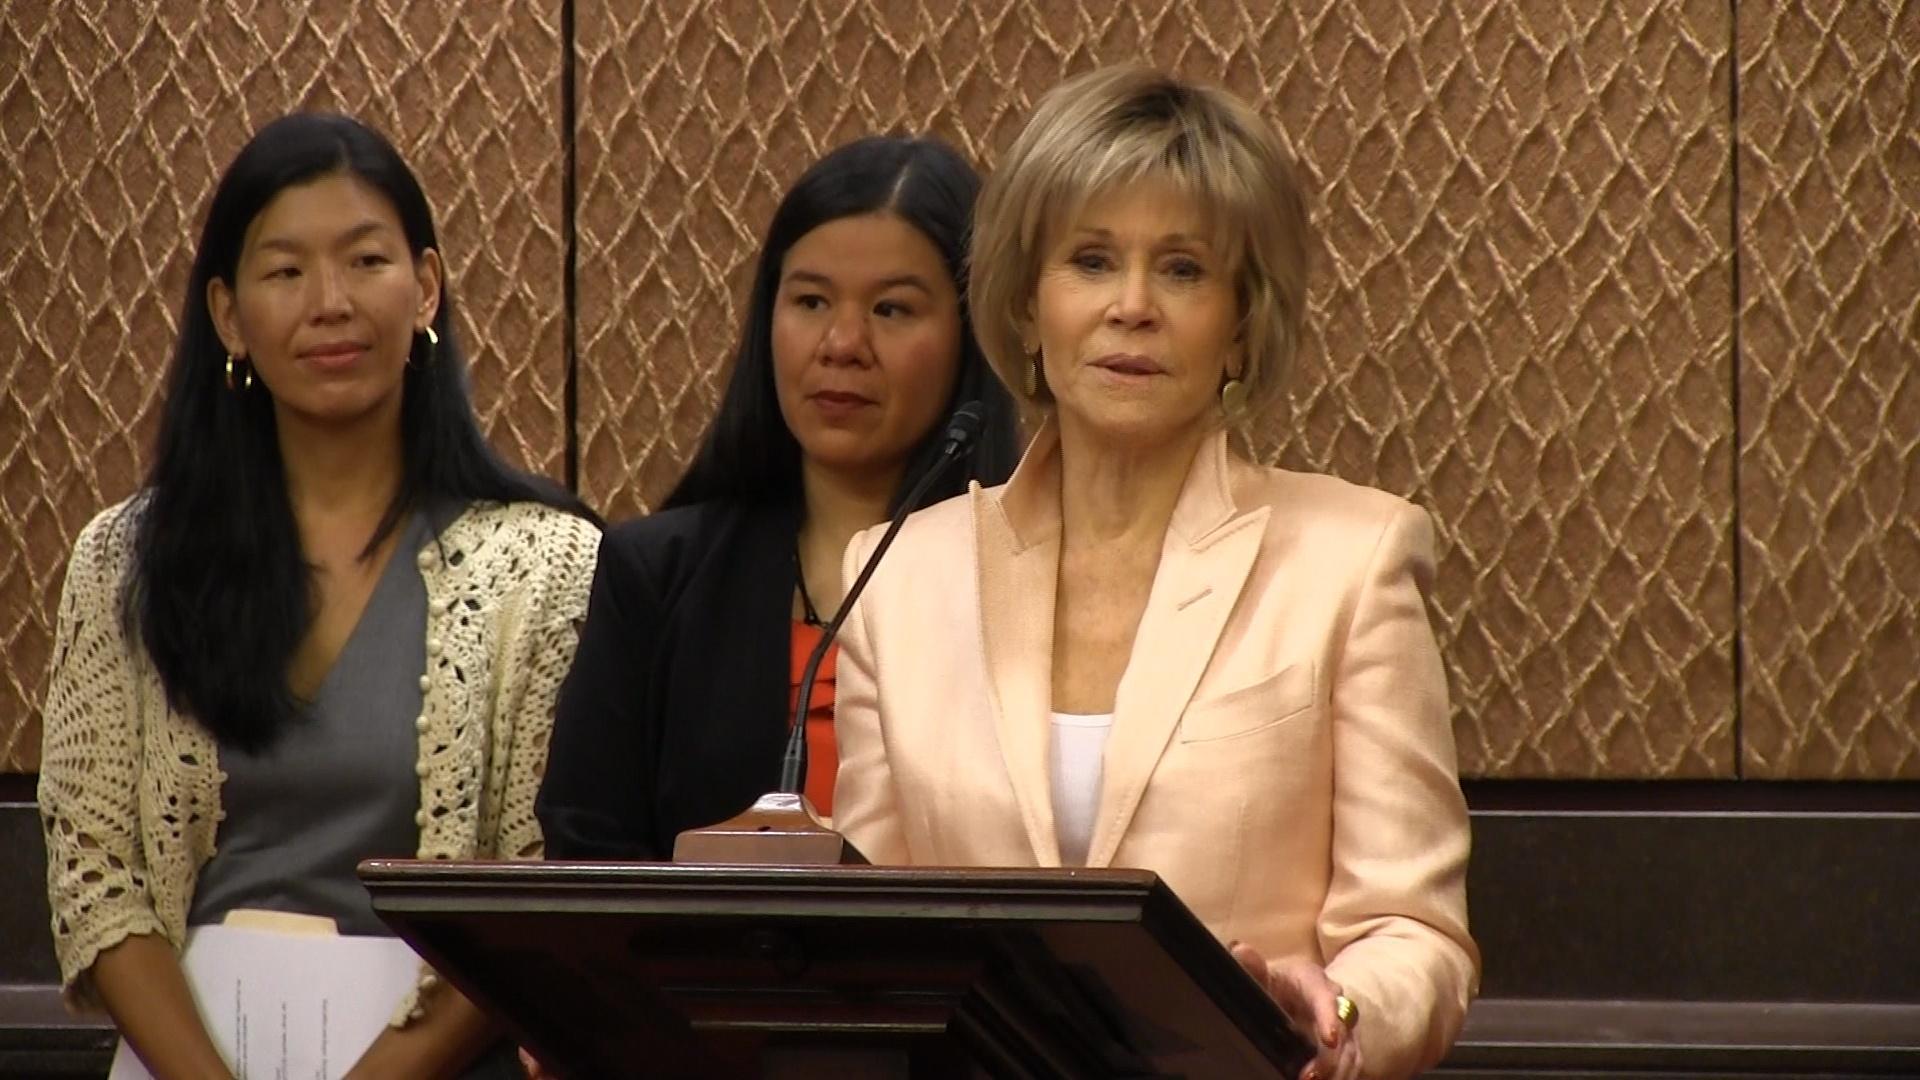 TTC Extra: Jane Fonda on Women's Rights At Work